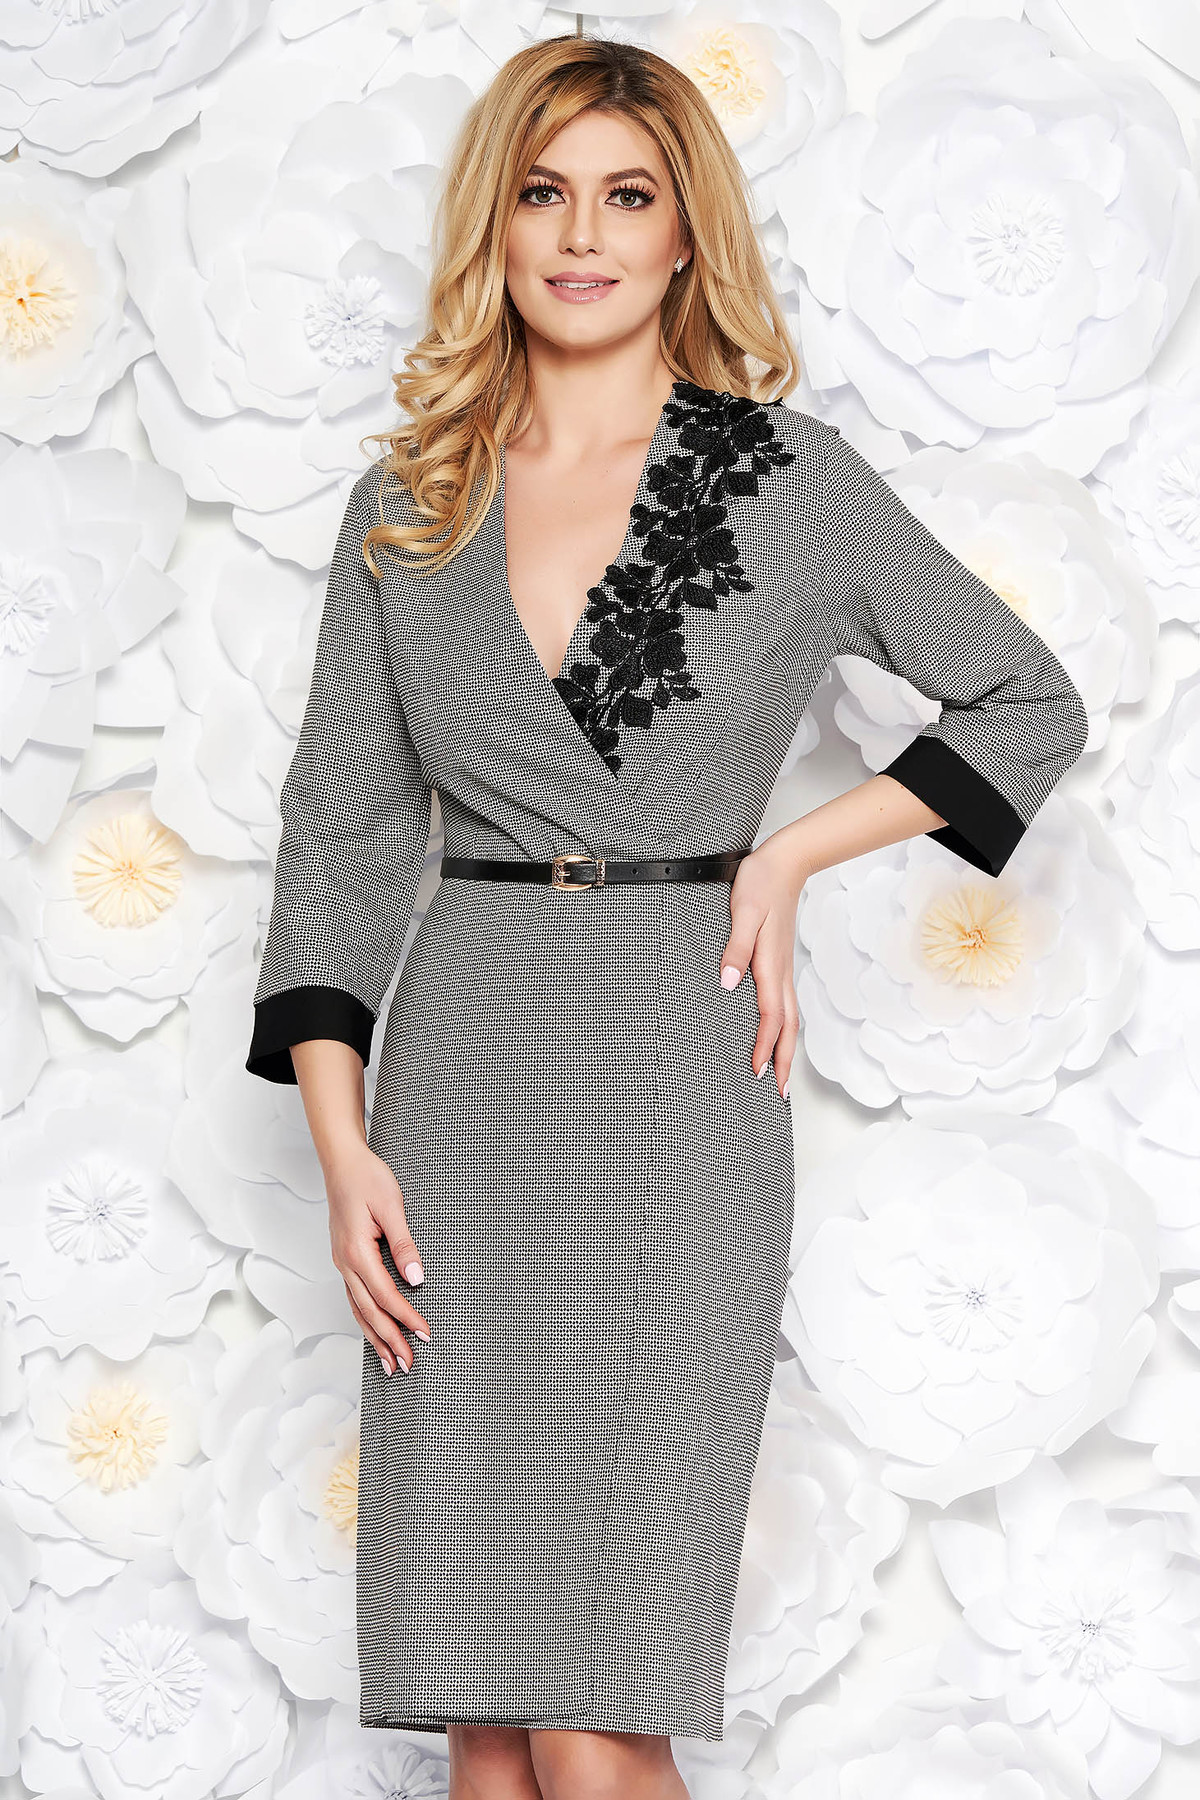 Rochie neagra eleganta din stofa neelastica cu decolteu in v cu aplicatii de dantela cu accesoriu tip curea